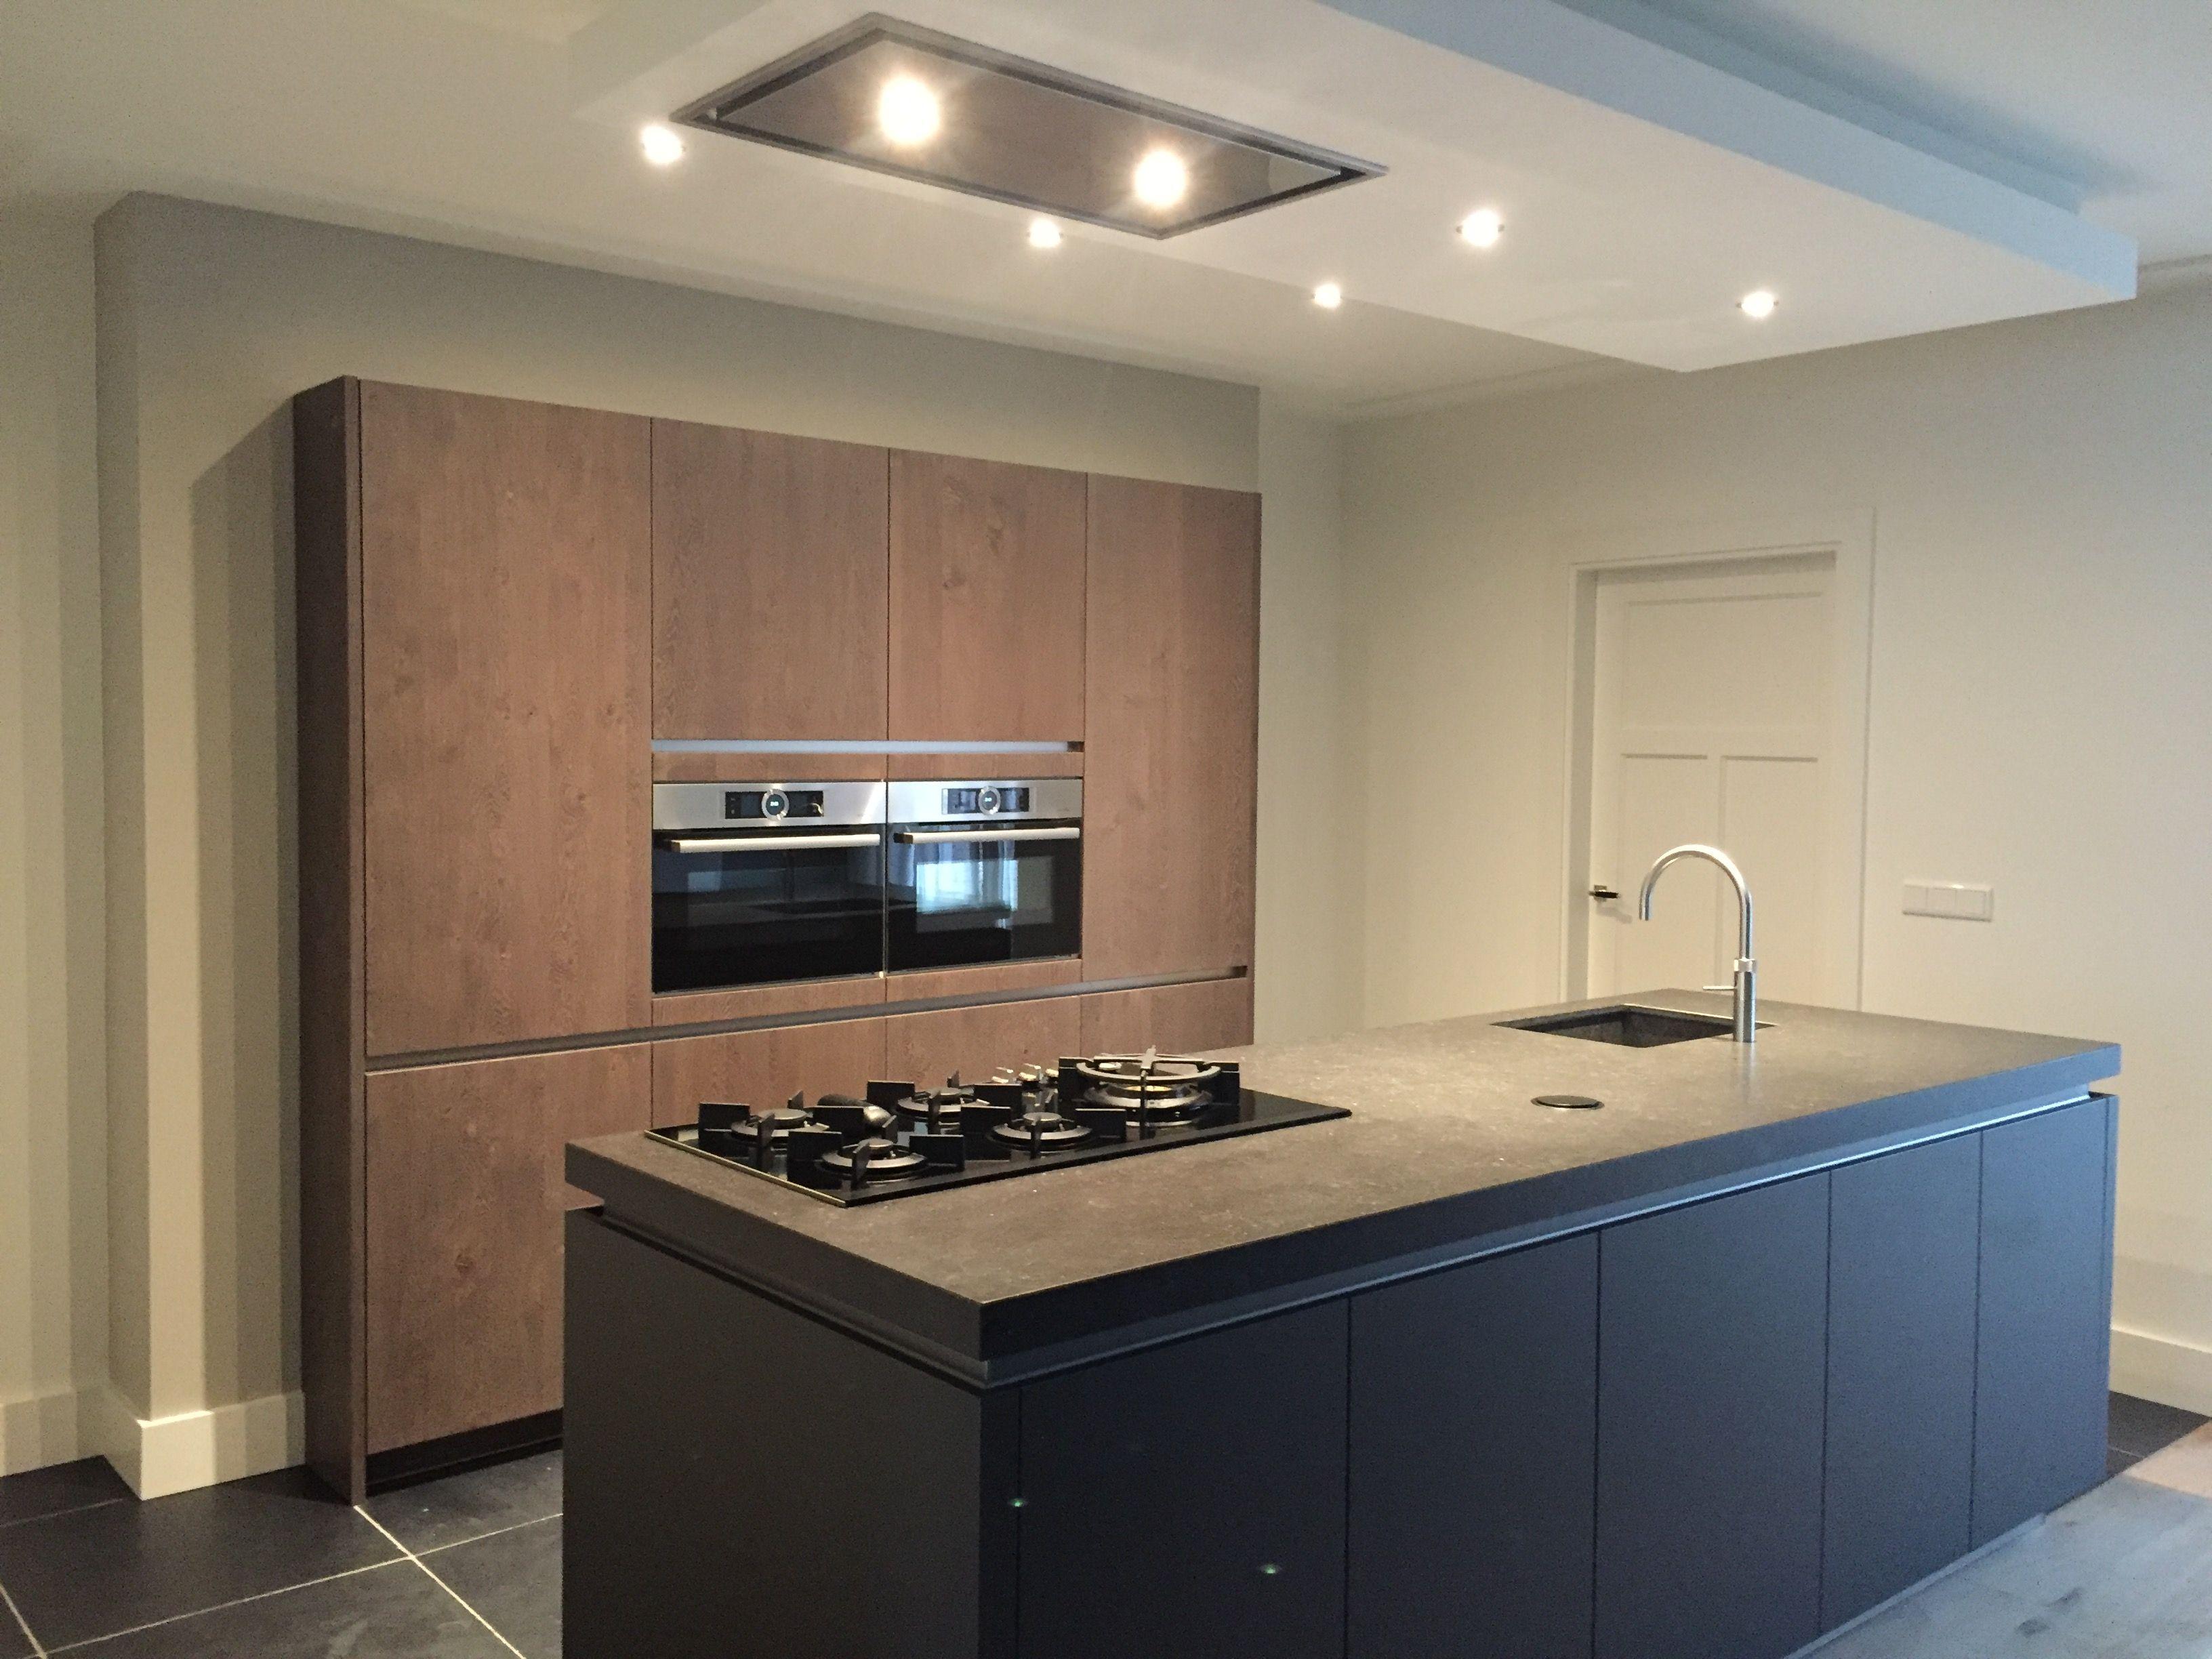 Keuken Beton Moderne : Kücheninsel beton moderne keuken kookeiland keuken met hout meer